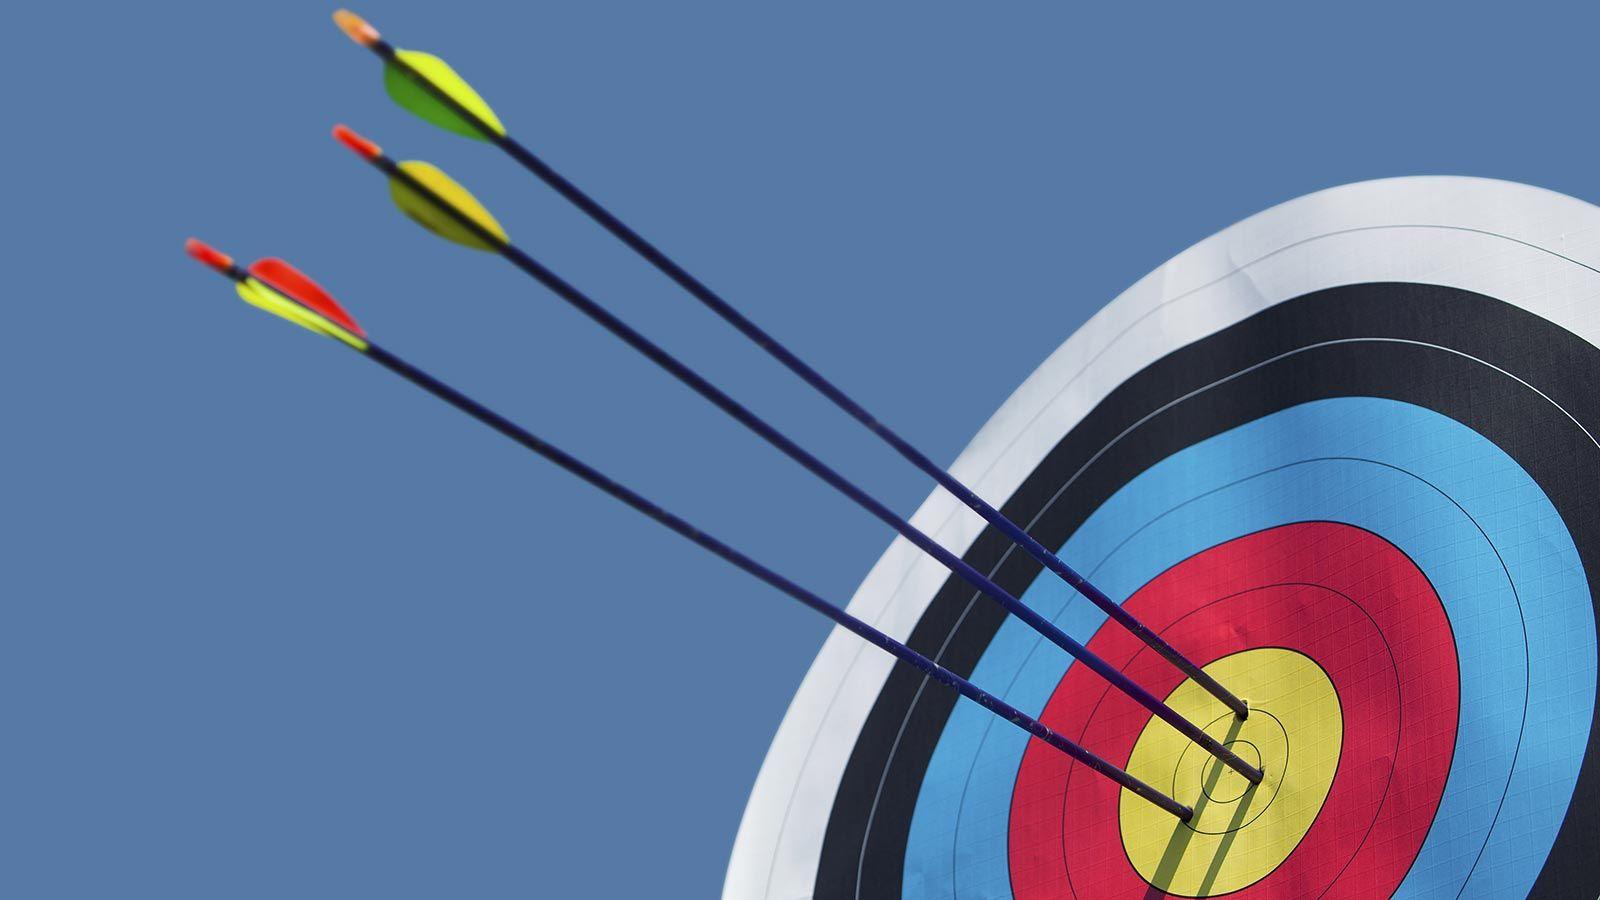 Target mobili ~ Diy axe throwing target tomahawk target axe